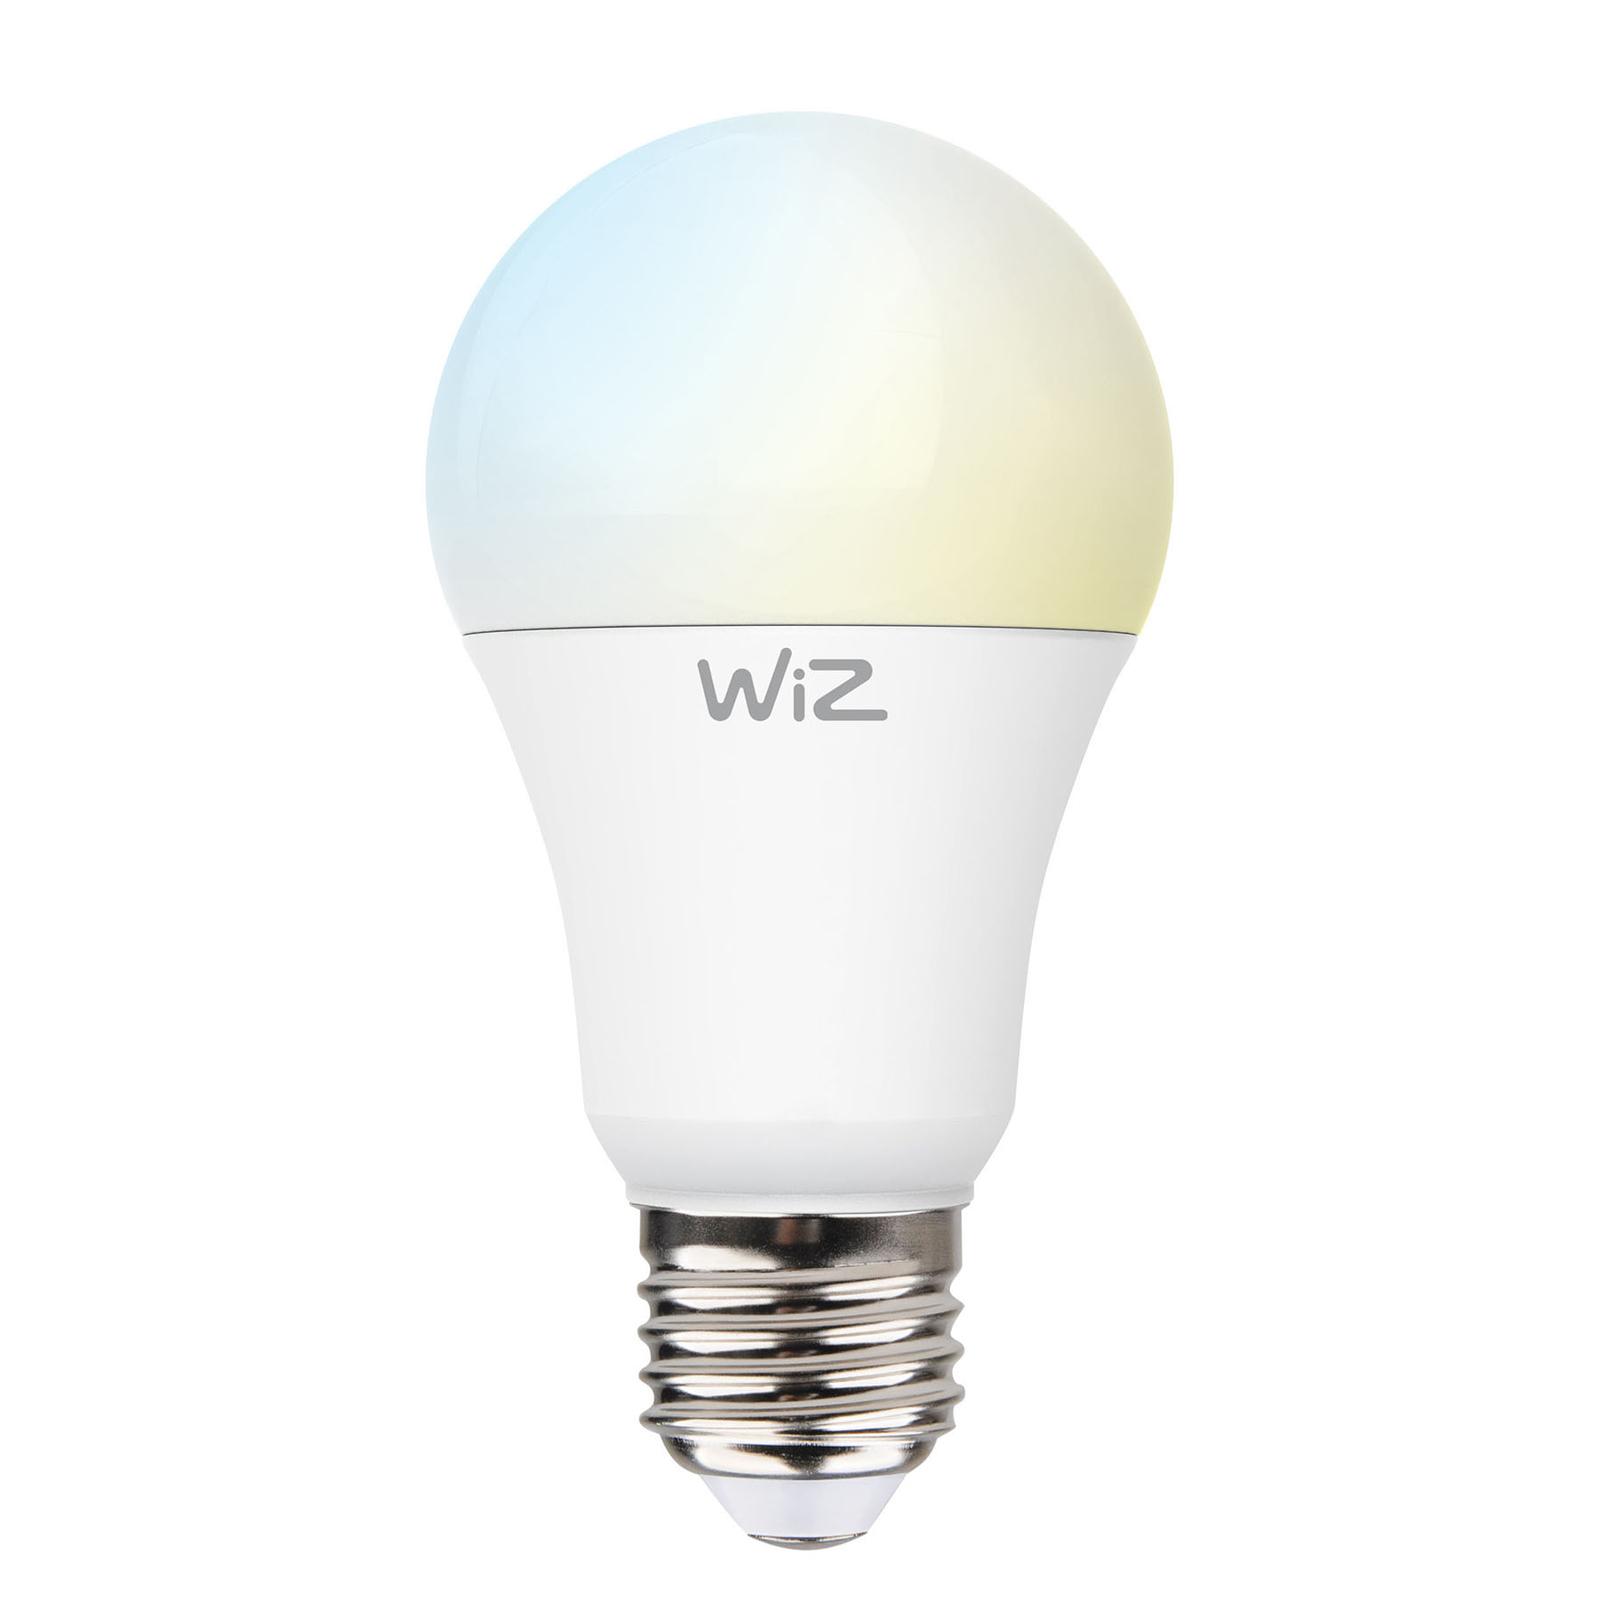 WiZ E27 LED-lamppu hehku A60 matta 9W 2700- 6500K